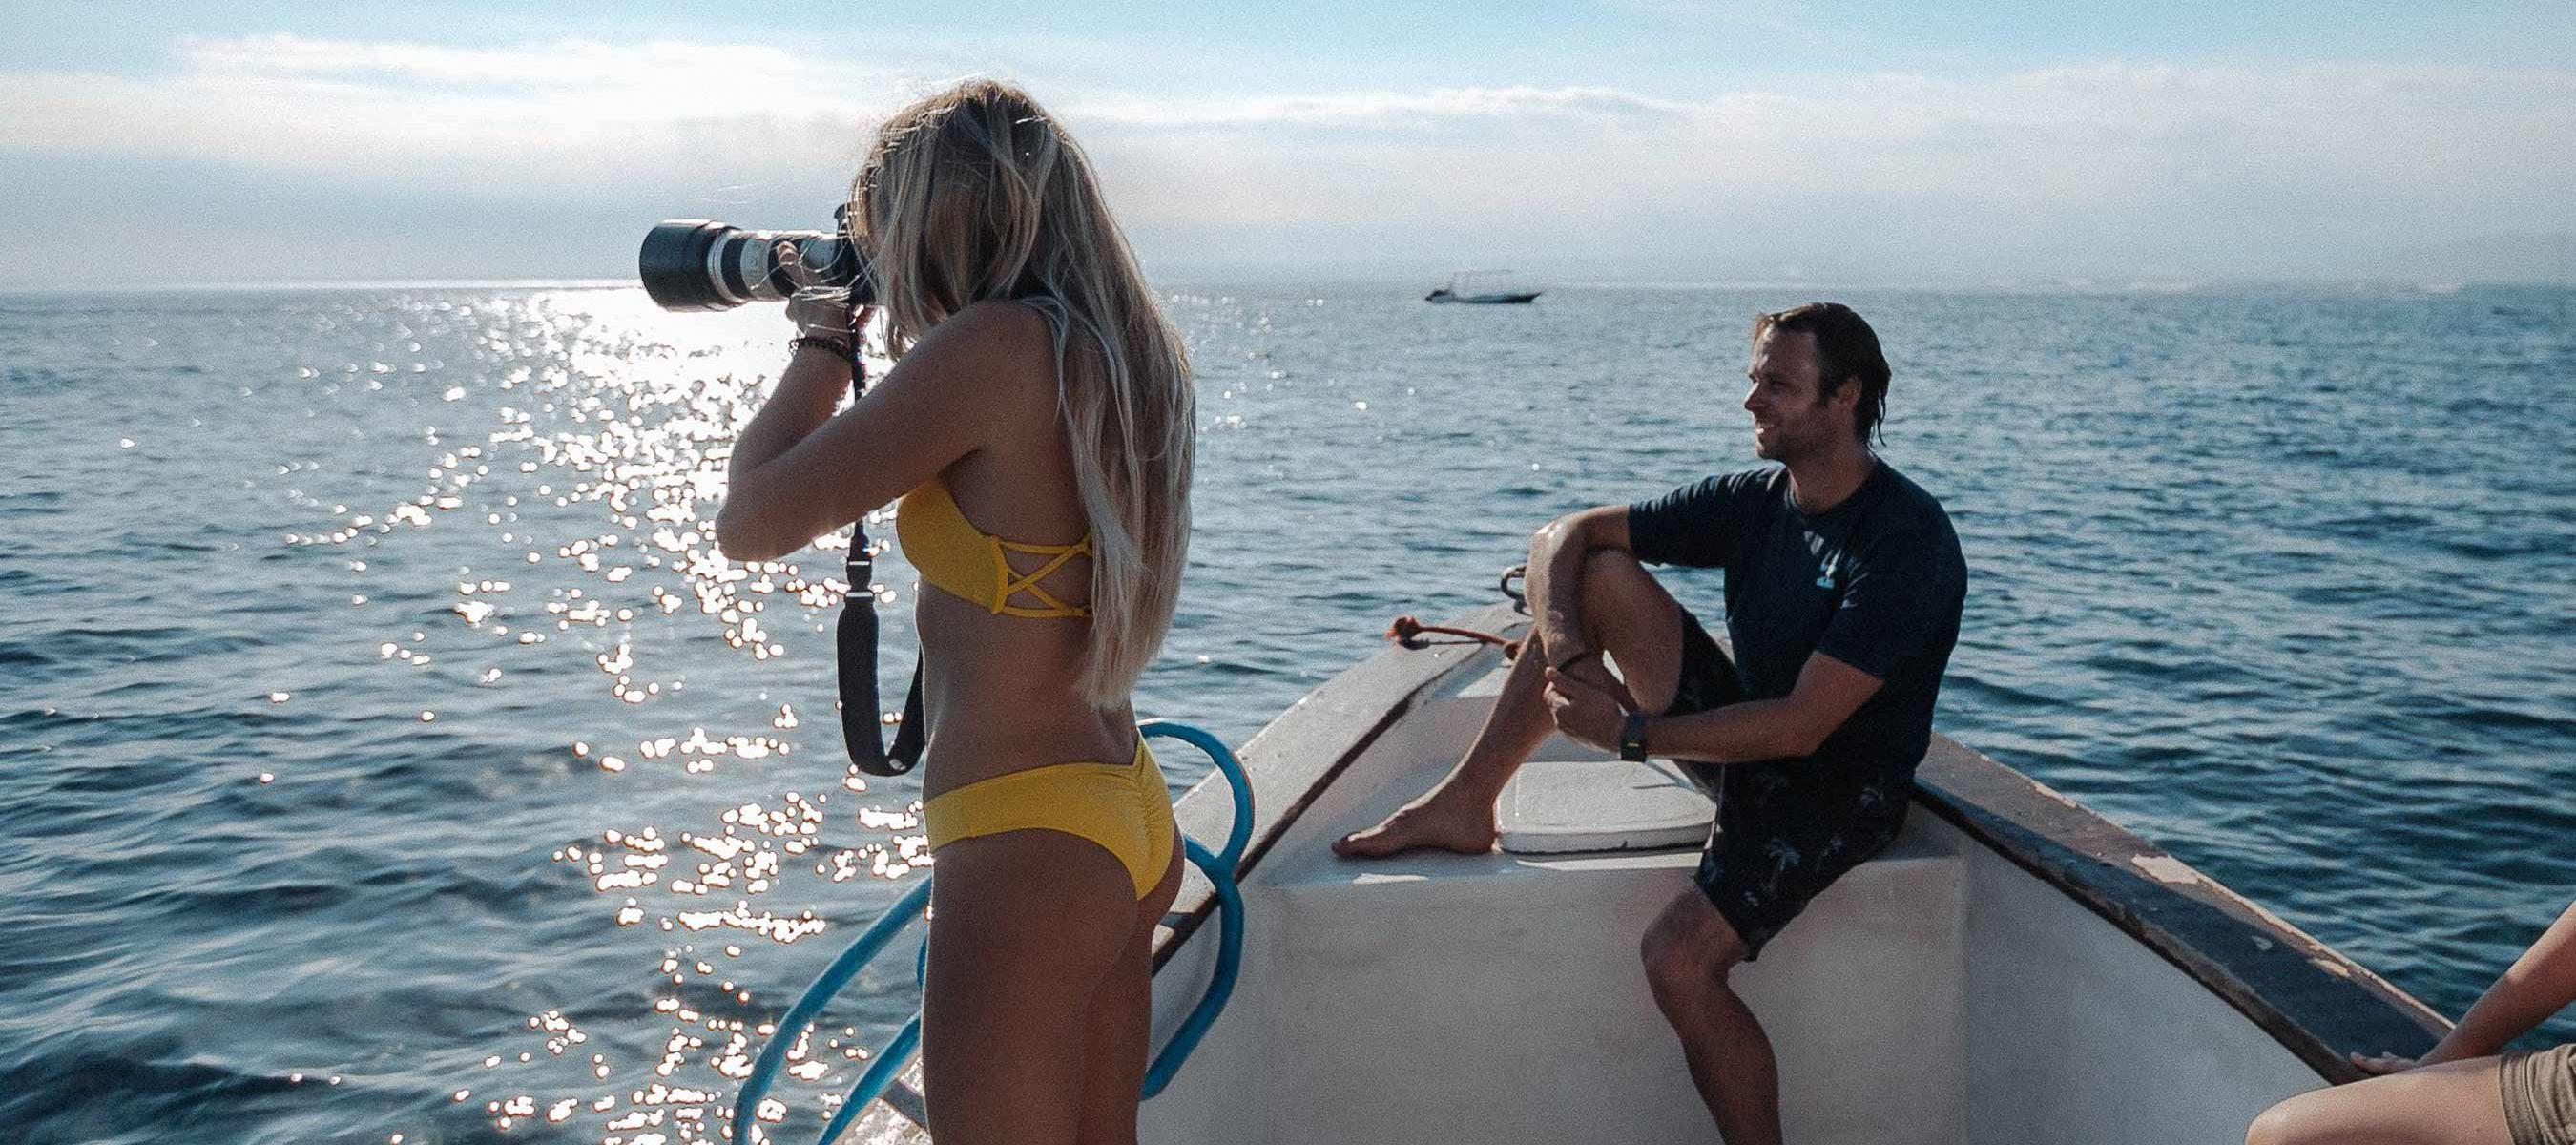 Naomi-Surf-Coach-Photo-Analysis